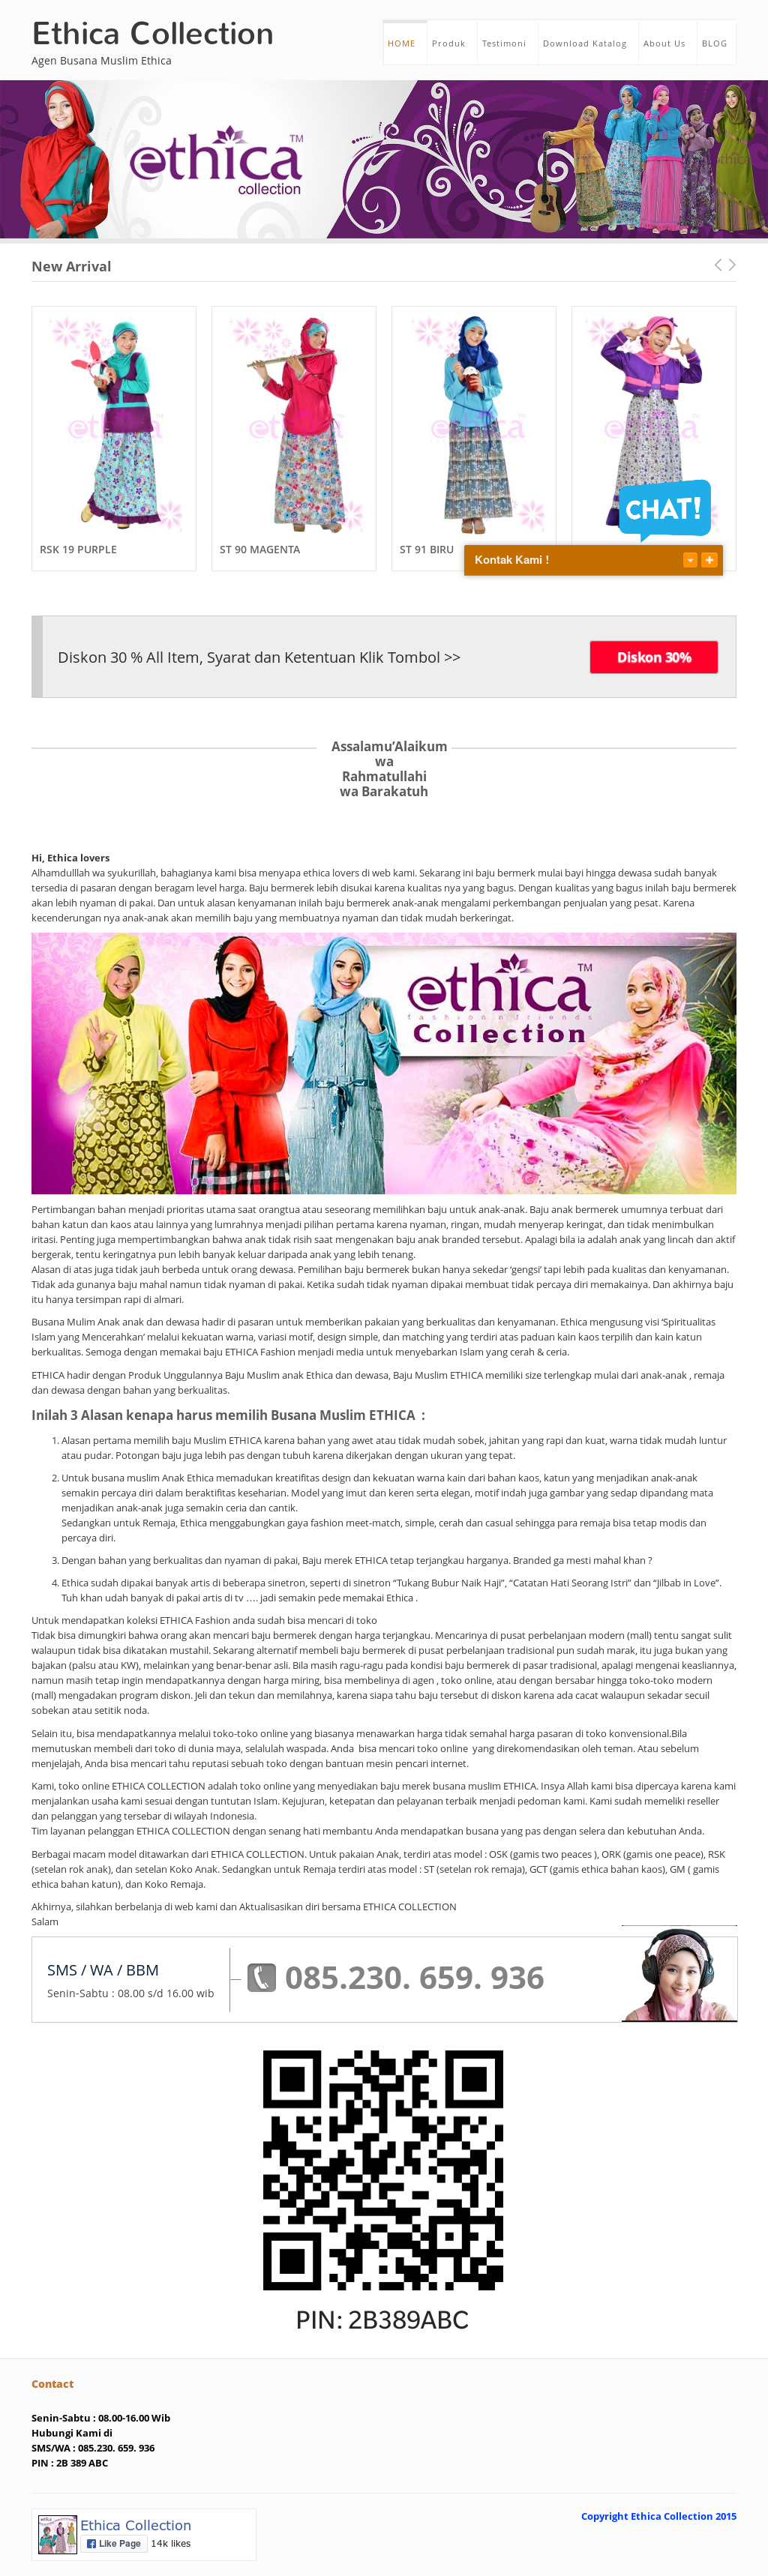 78 Gambar Baju Ethica HD